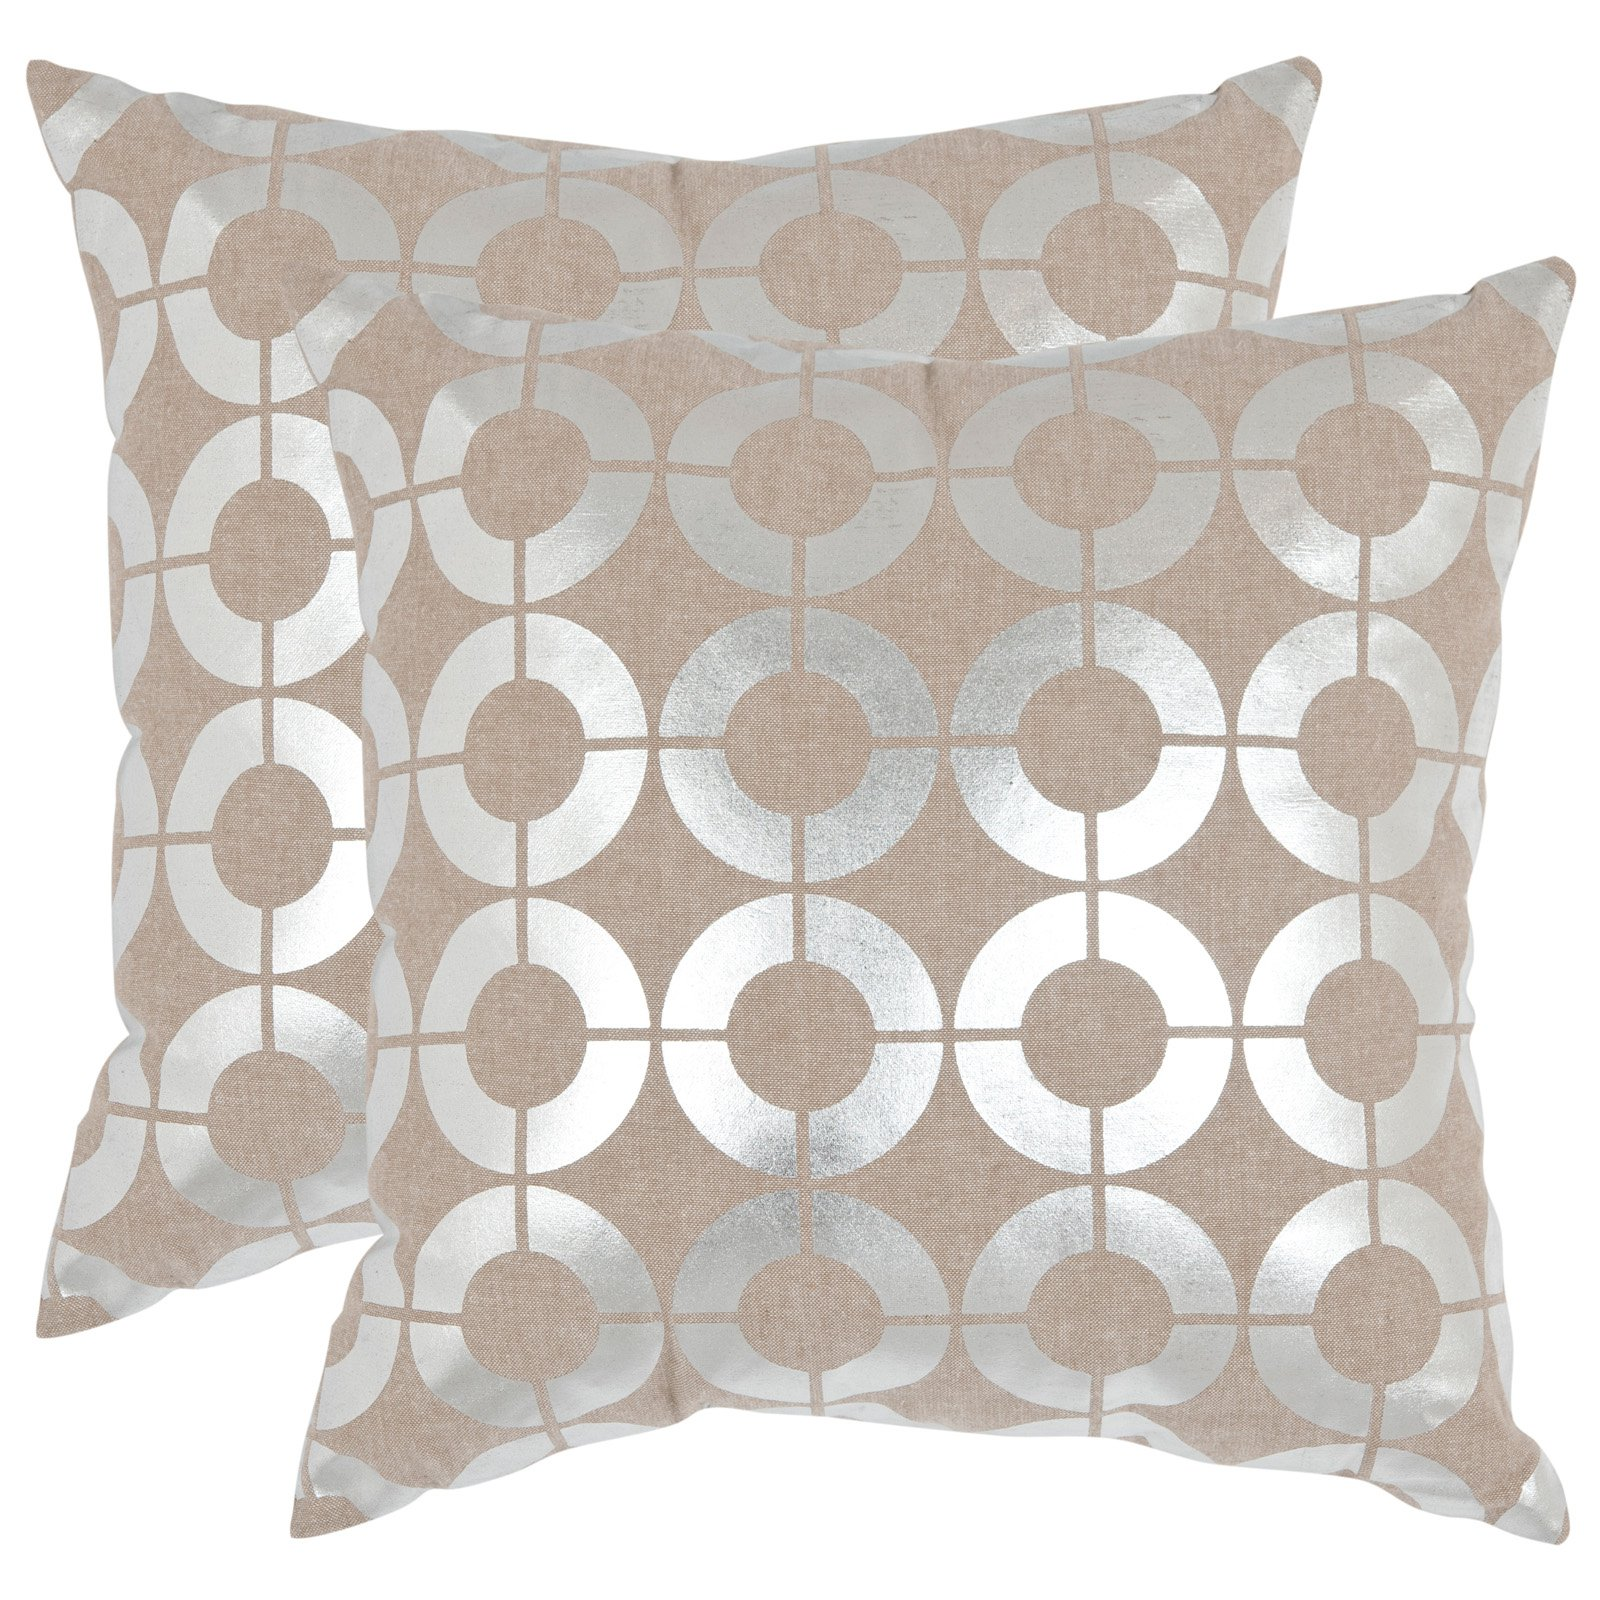 Safavieh Bailey Decorative Pillow - Set of 2